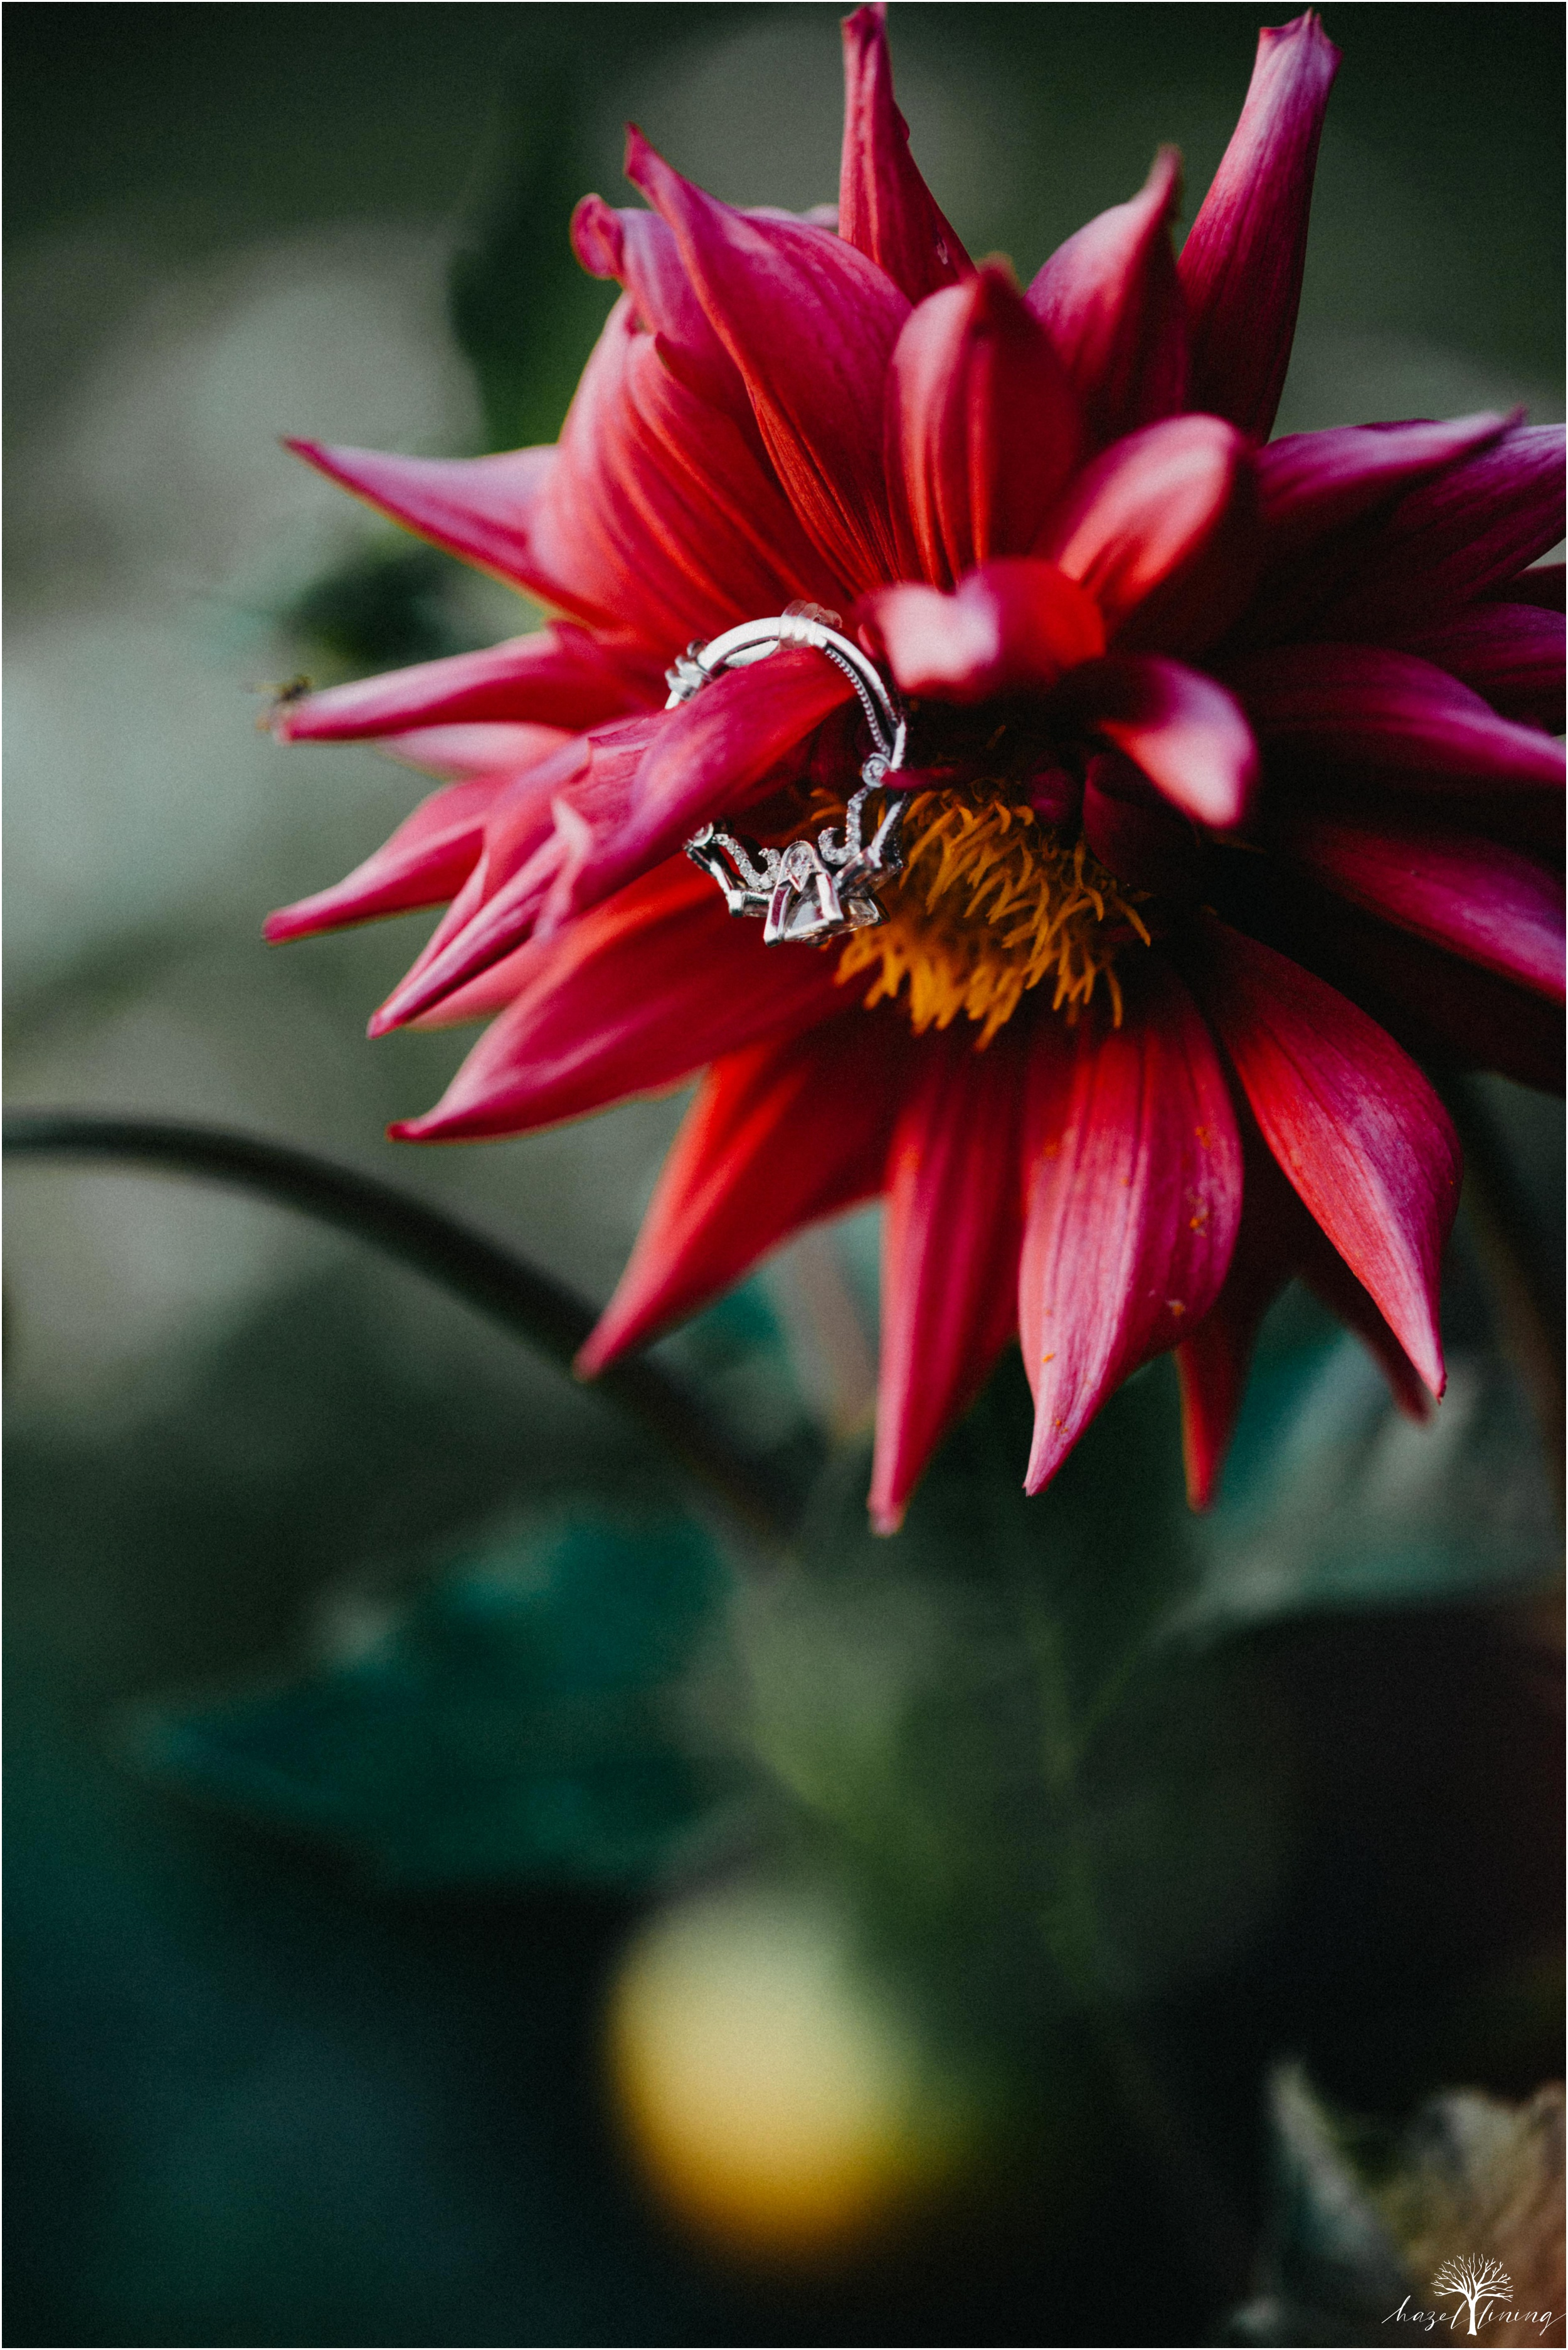 rachel-warner-chris-niedrist-the-farm-bakery-and-events-quakertown-pa-summer-engagement-hazel-lining-photography-destination-elopement-wedding-engagement-photography_0031.jpg